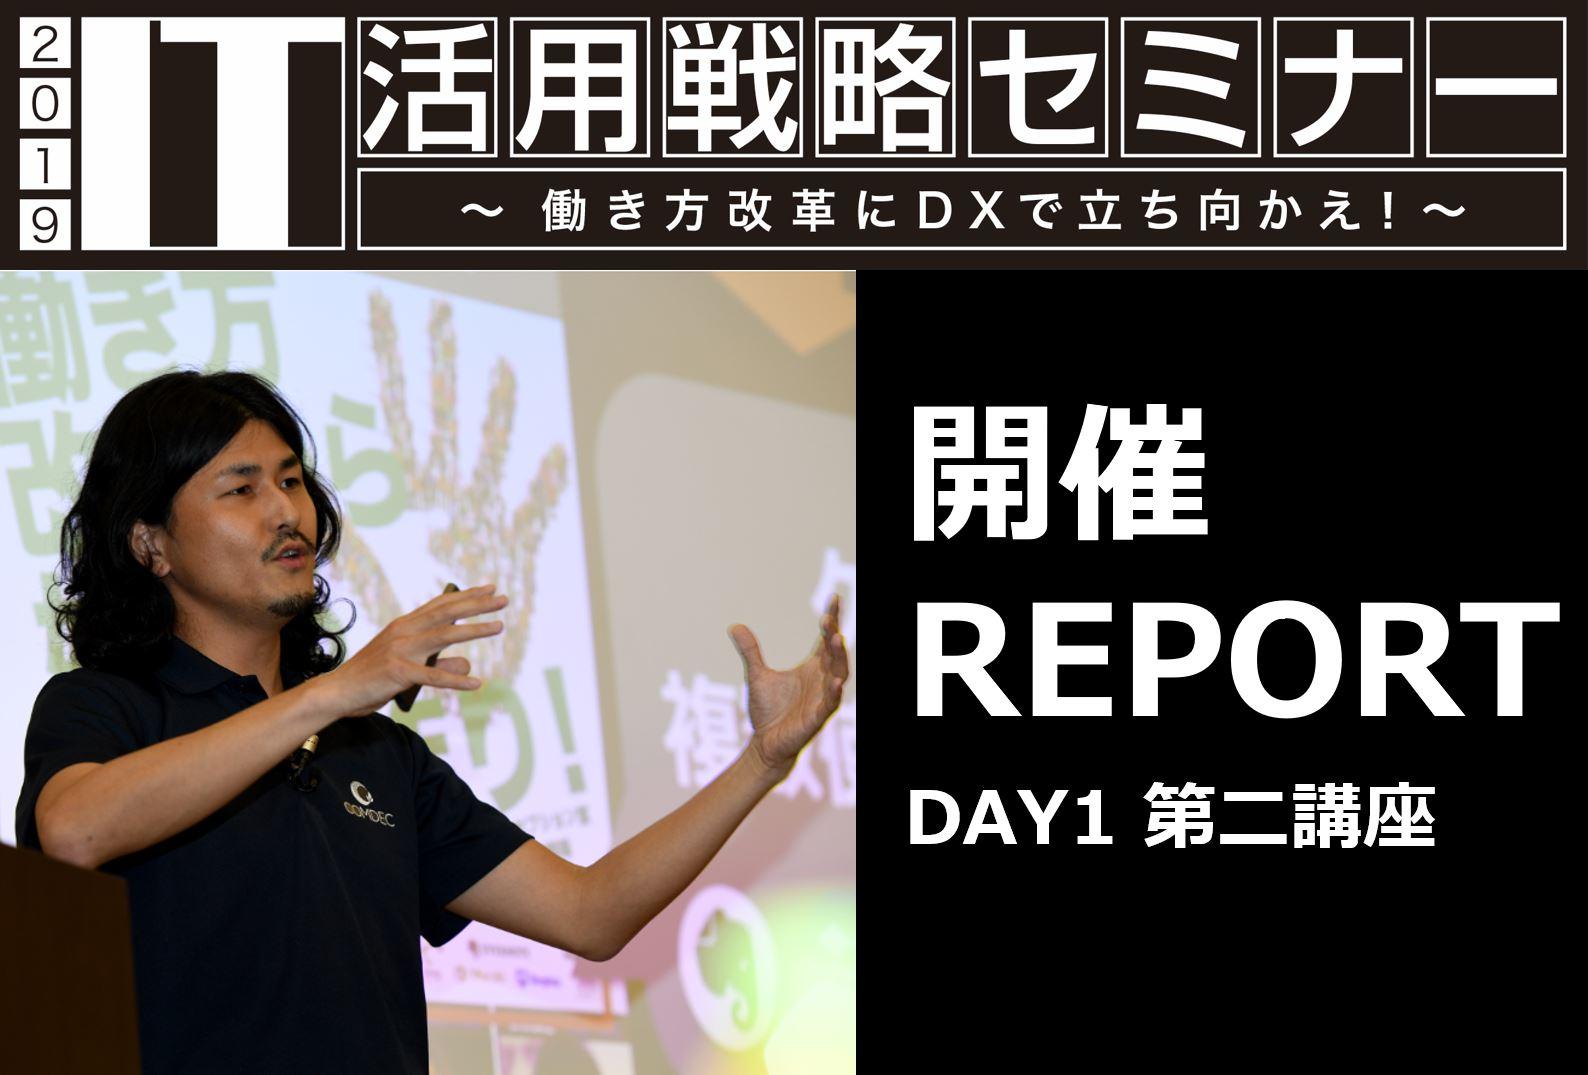 IT活用戦略セミナー2019 DAY1 第二講座レポート|株式会社コムデック 専務取締役・クラウド事業部部長 生田 智之